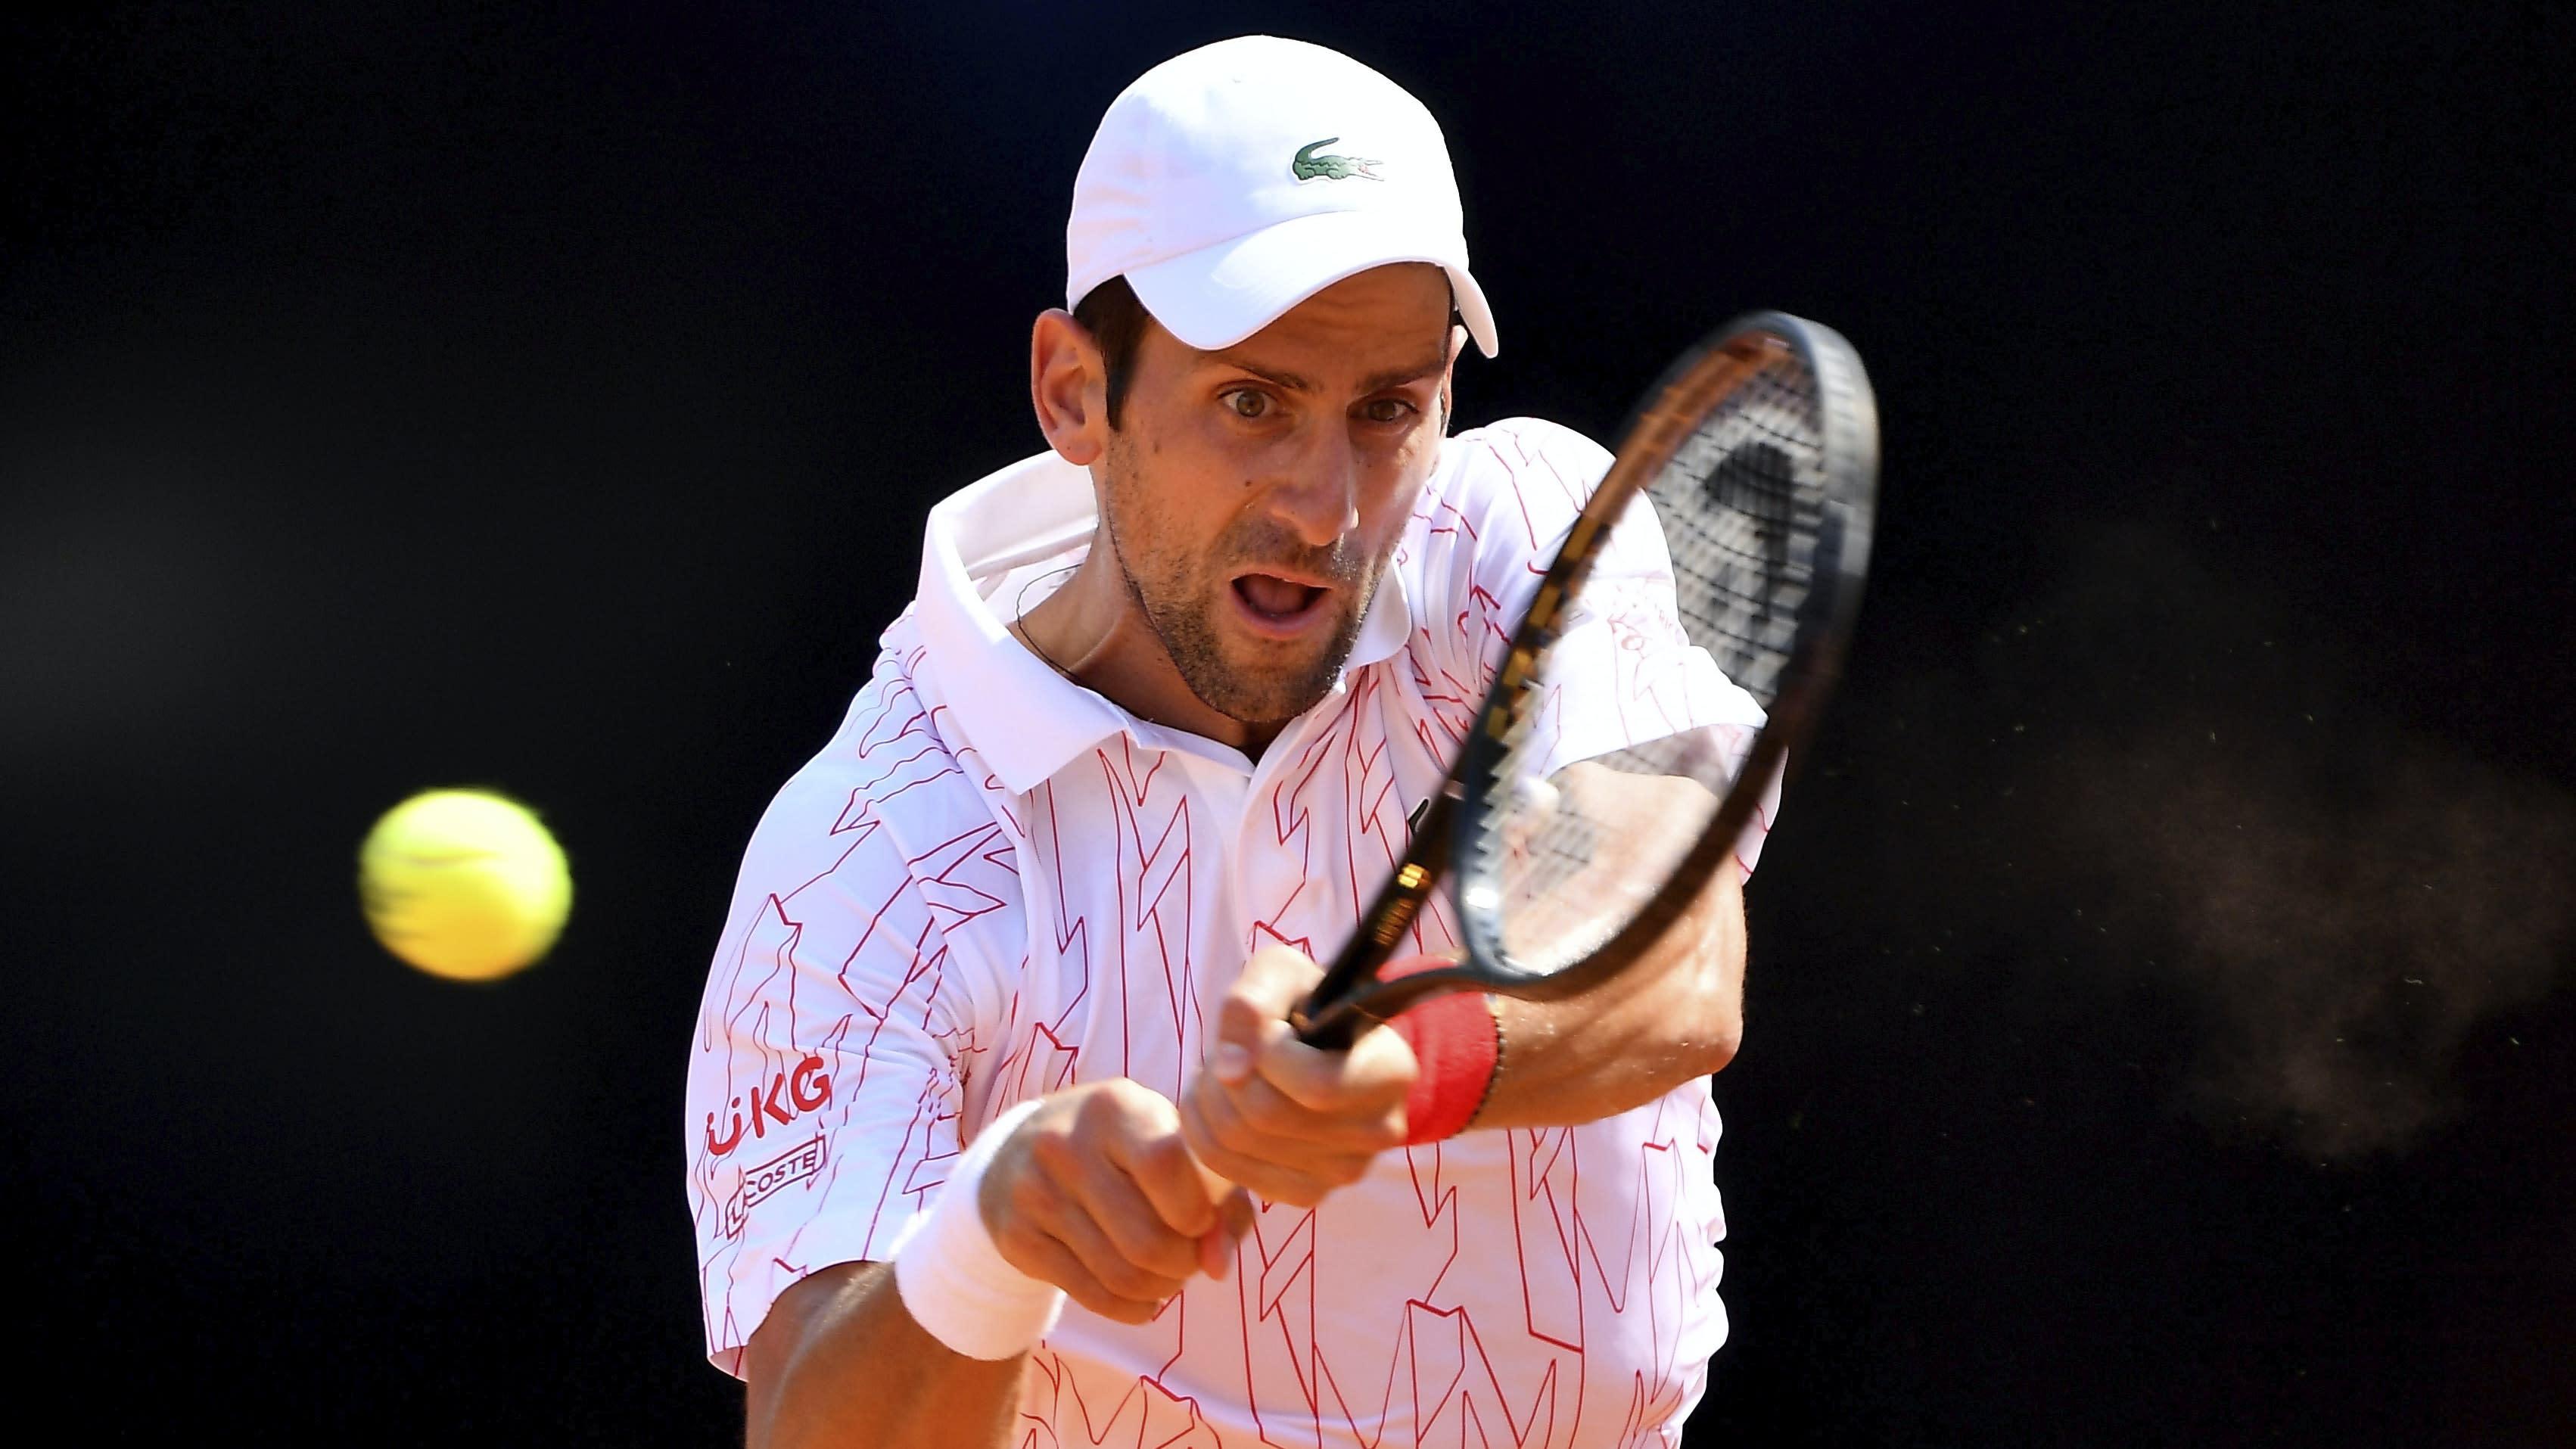 Novak Djokovic claims fifth Italian Open title with win over Diego Schwartzman